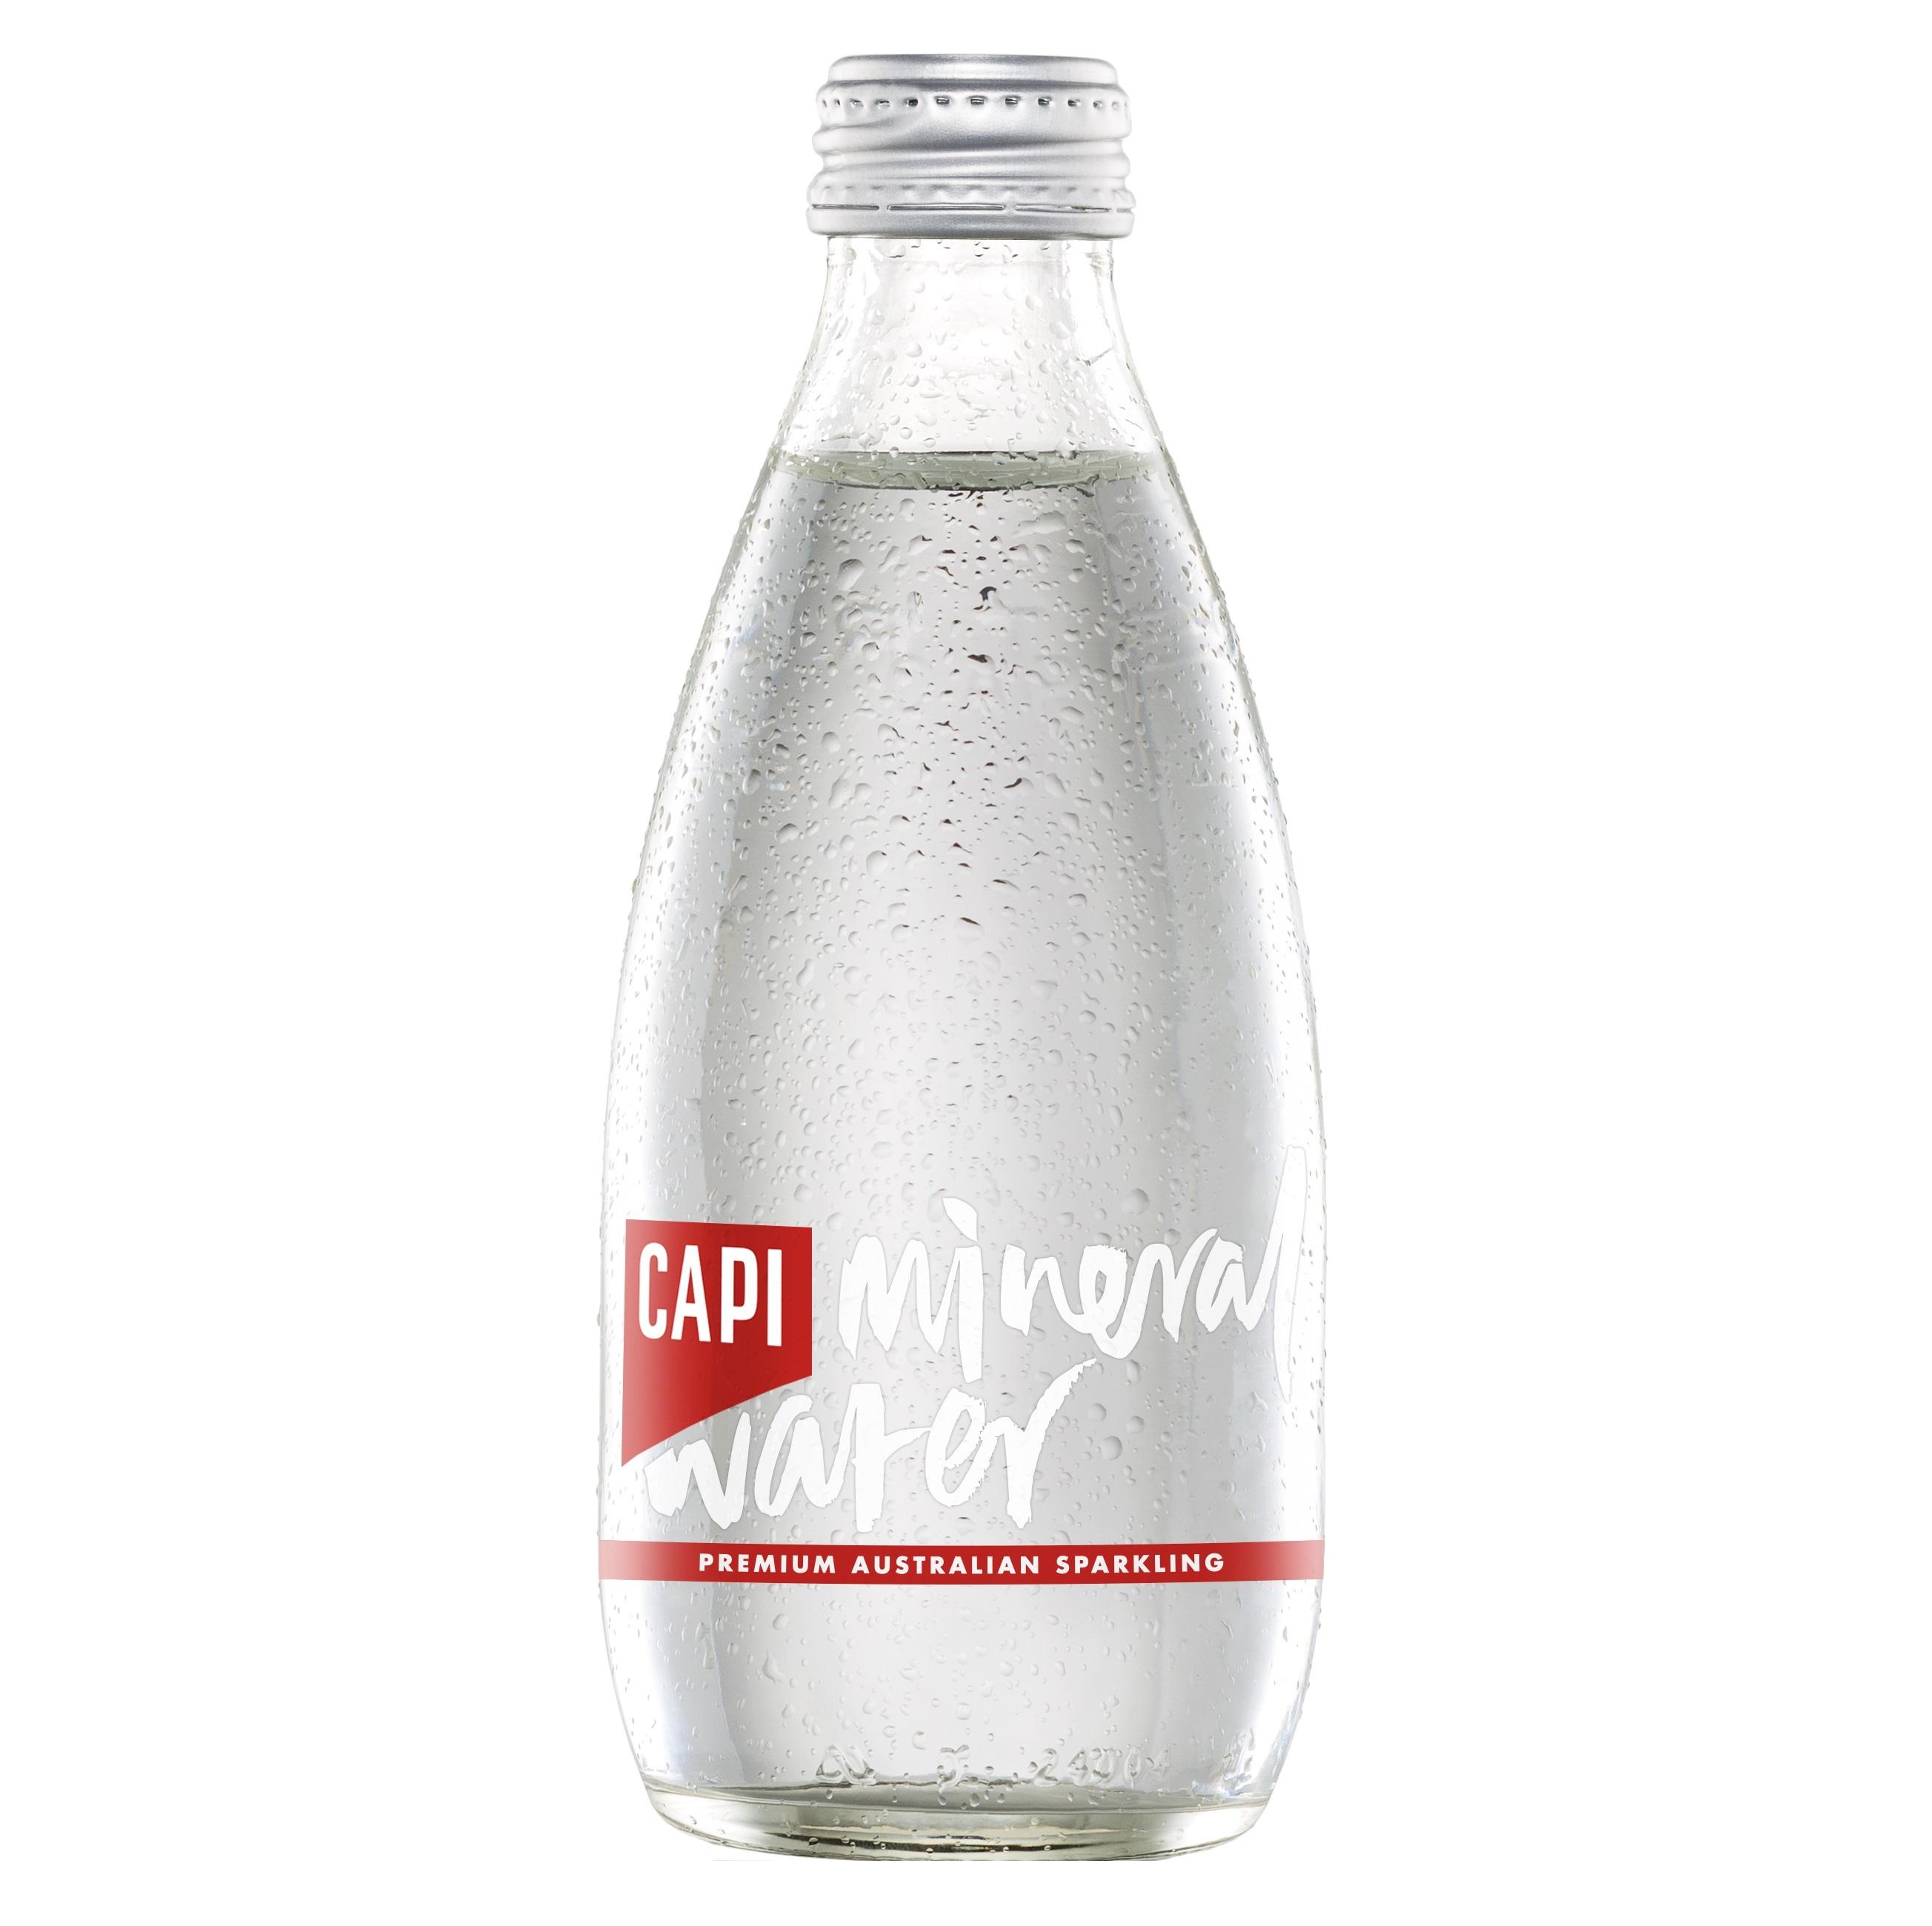 CAPI(カピ) スパークリングミネラルウォーター ビン <発泡>